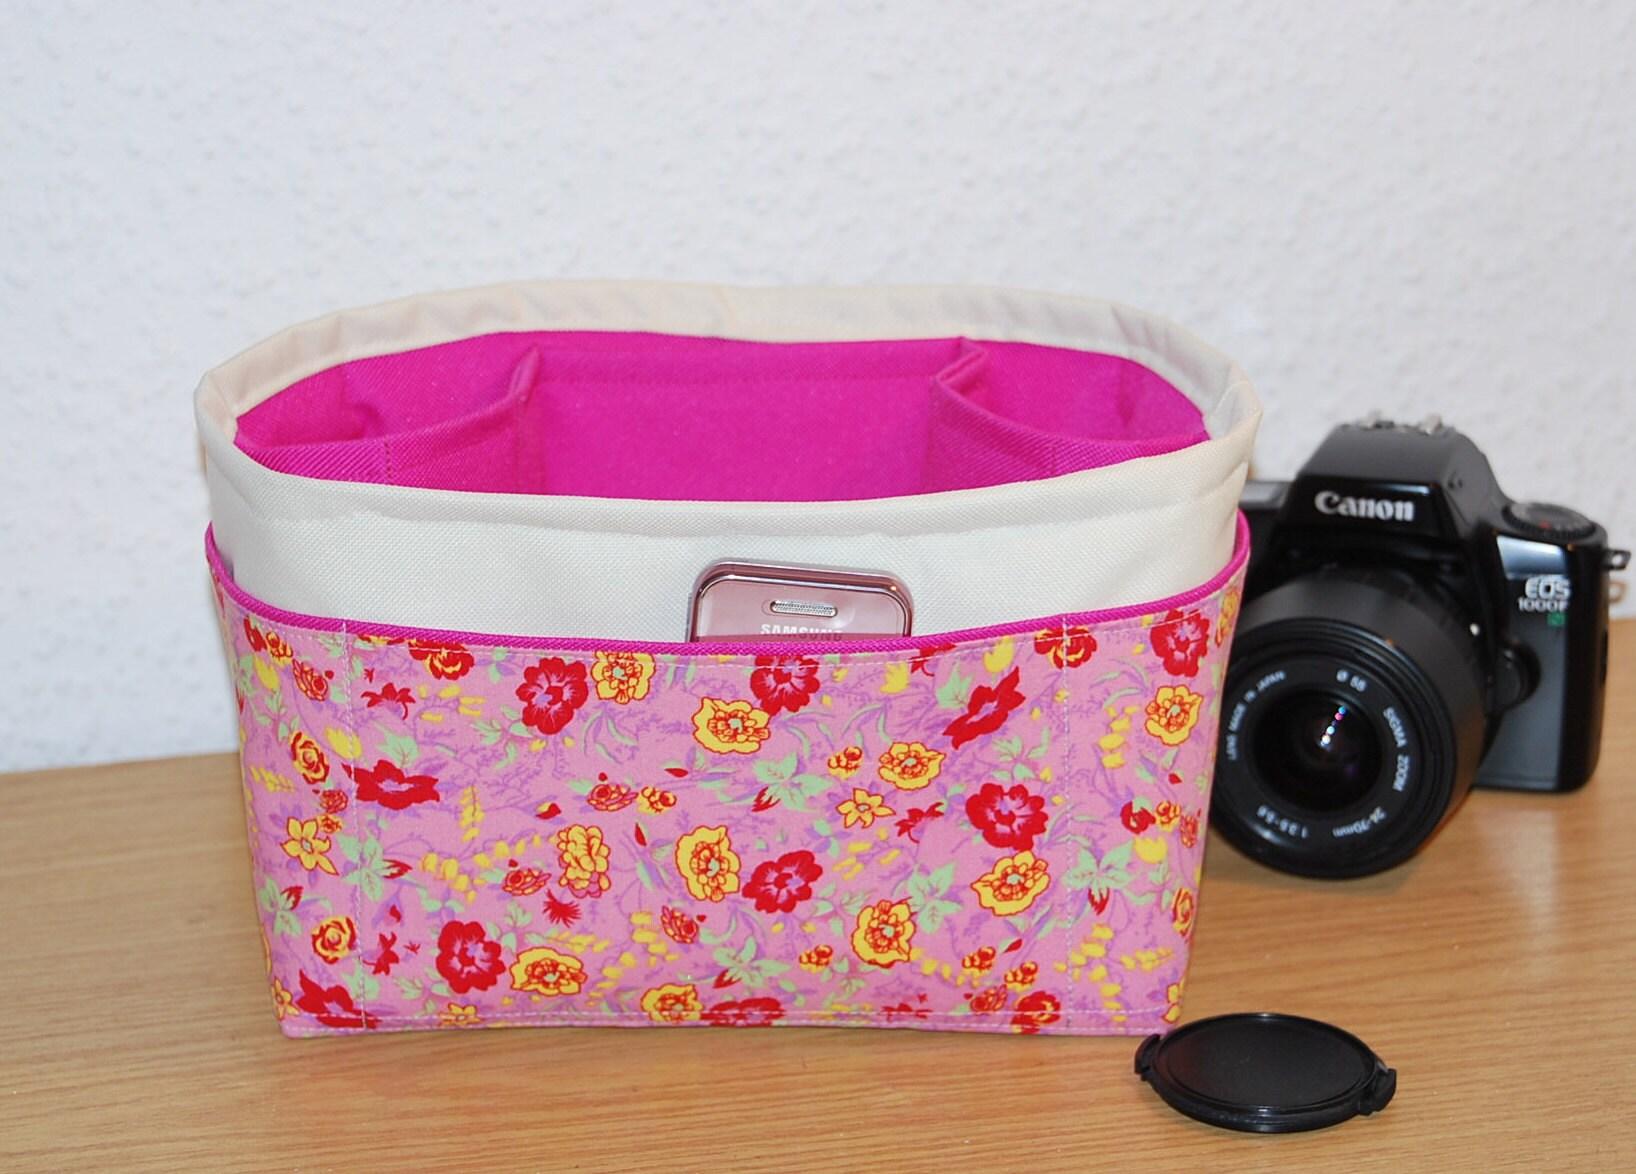 Waterproof Waterproof Camera Insert Camera Bag Camera Etsy